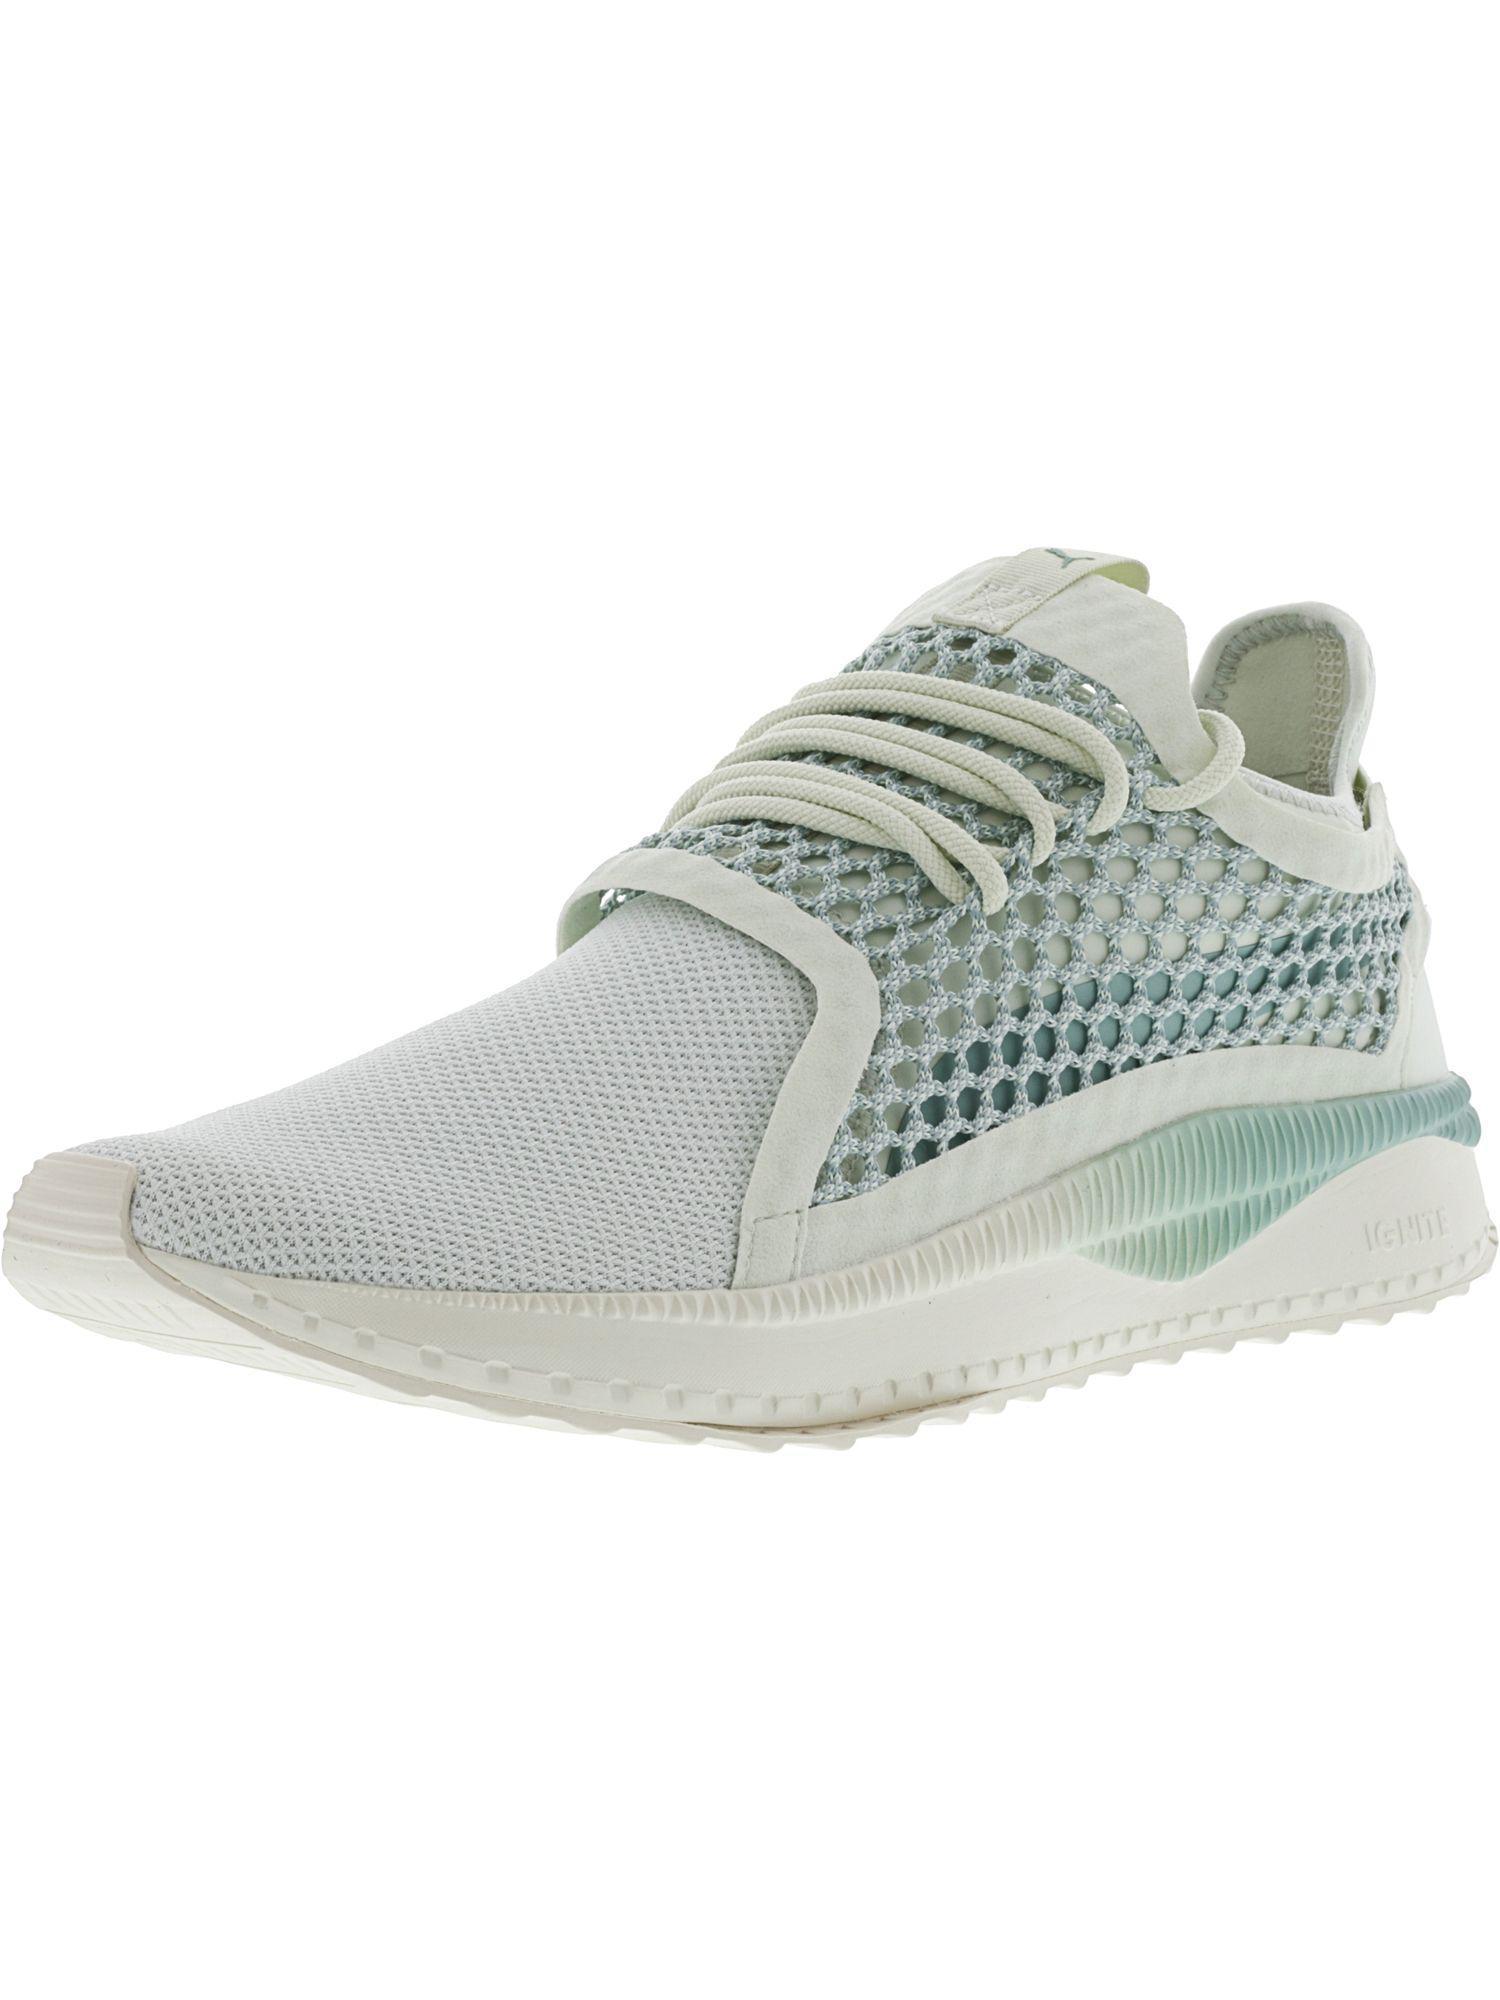 788838ccfcb4 Lyst - Puma Men s Tsugi Netfit V2 Ankle-high Fabric Fashion Sneaker ...